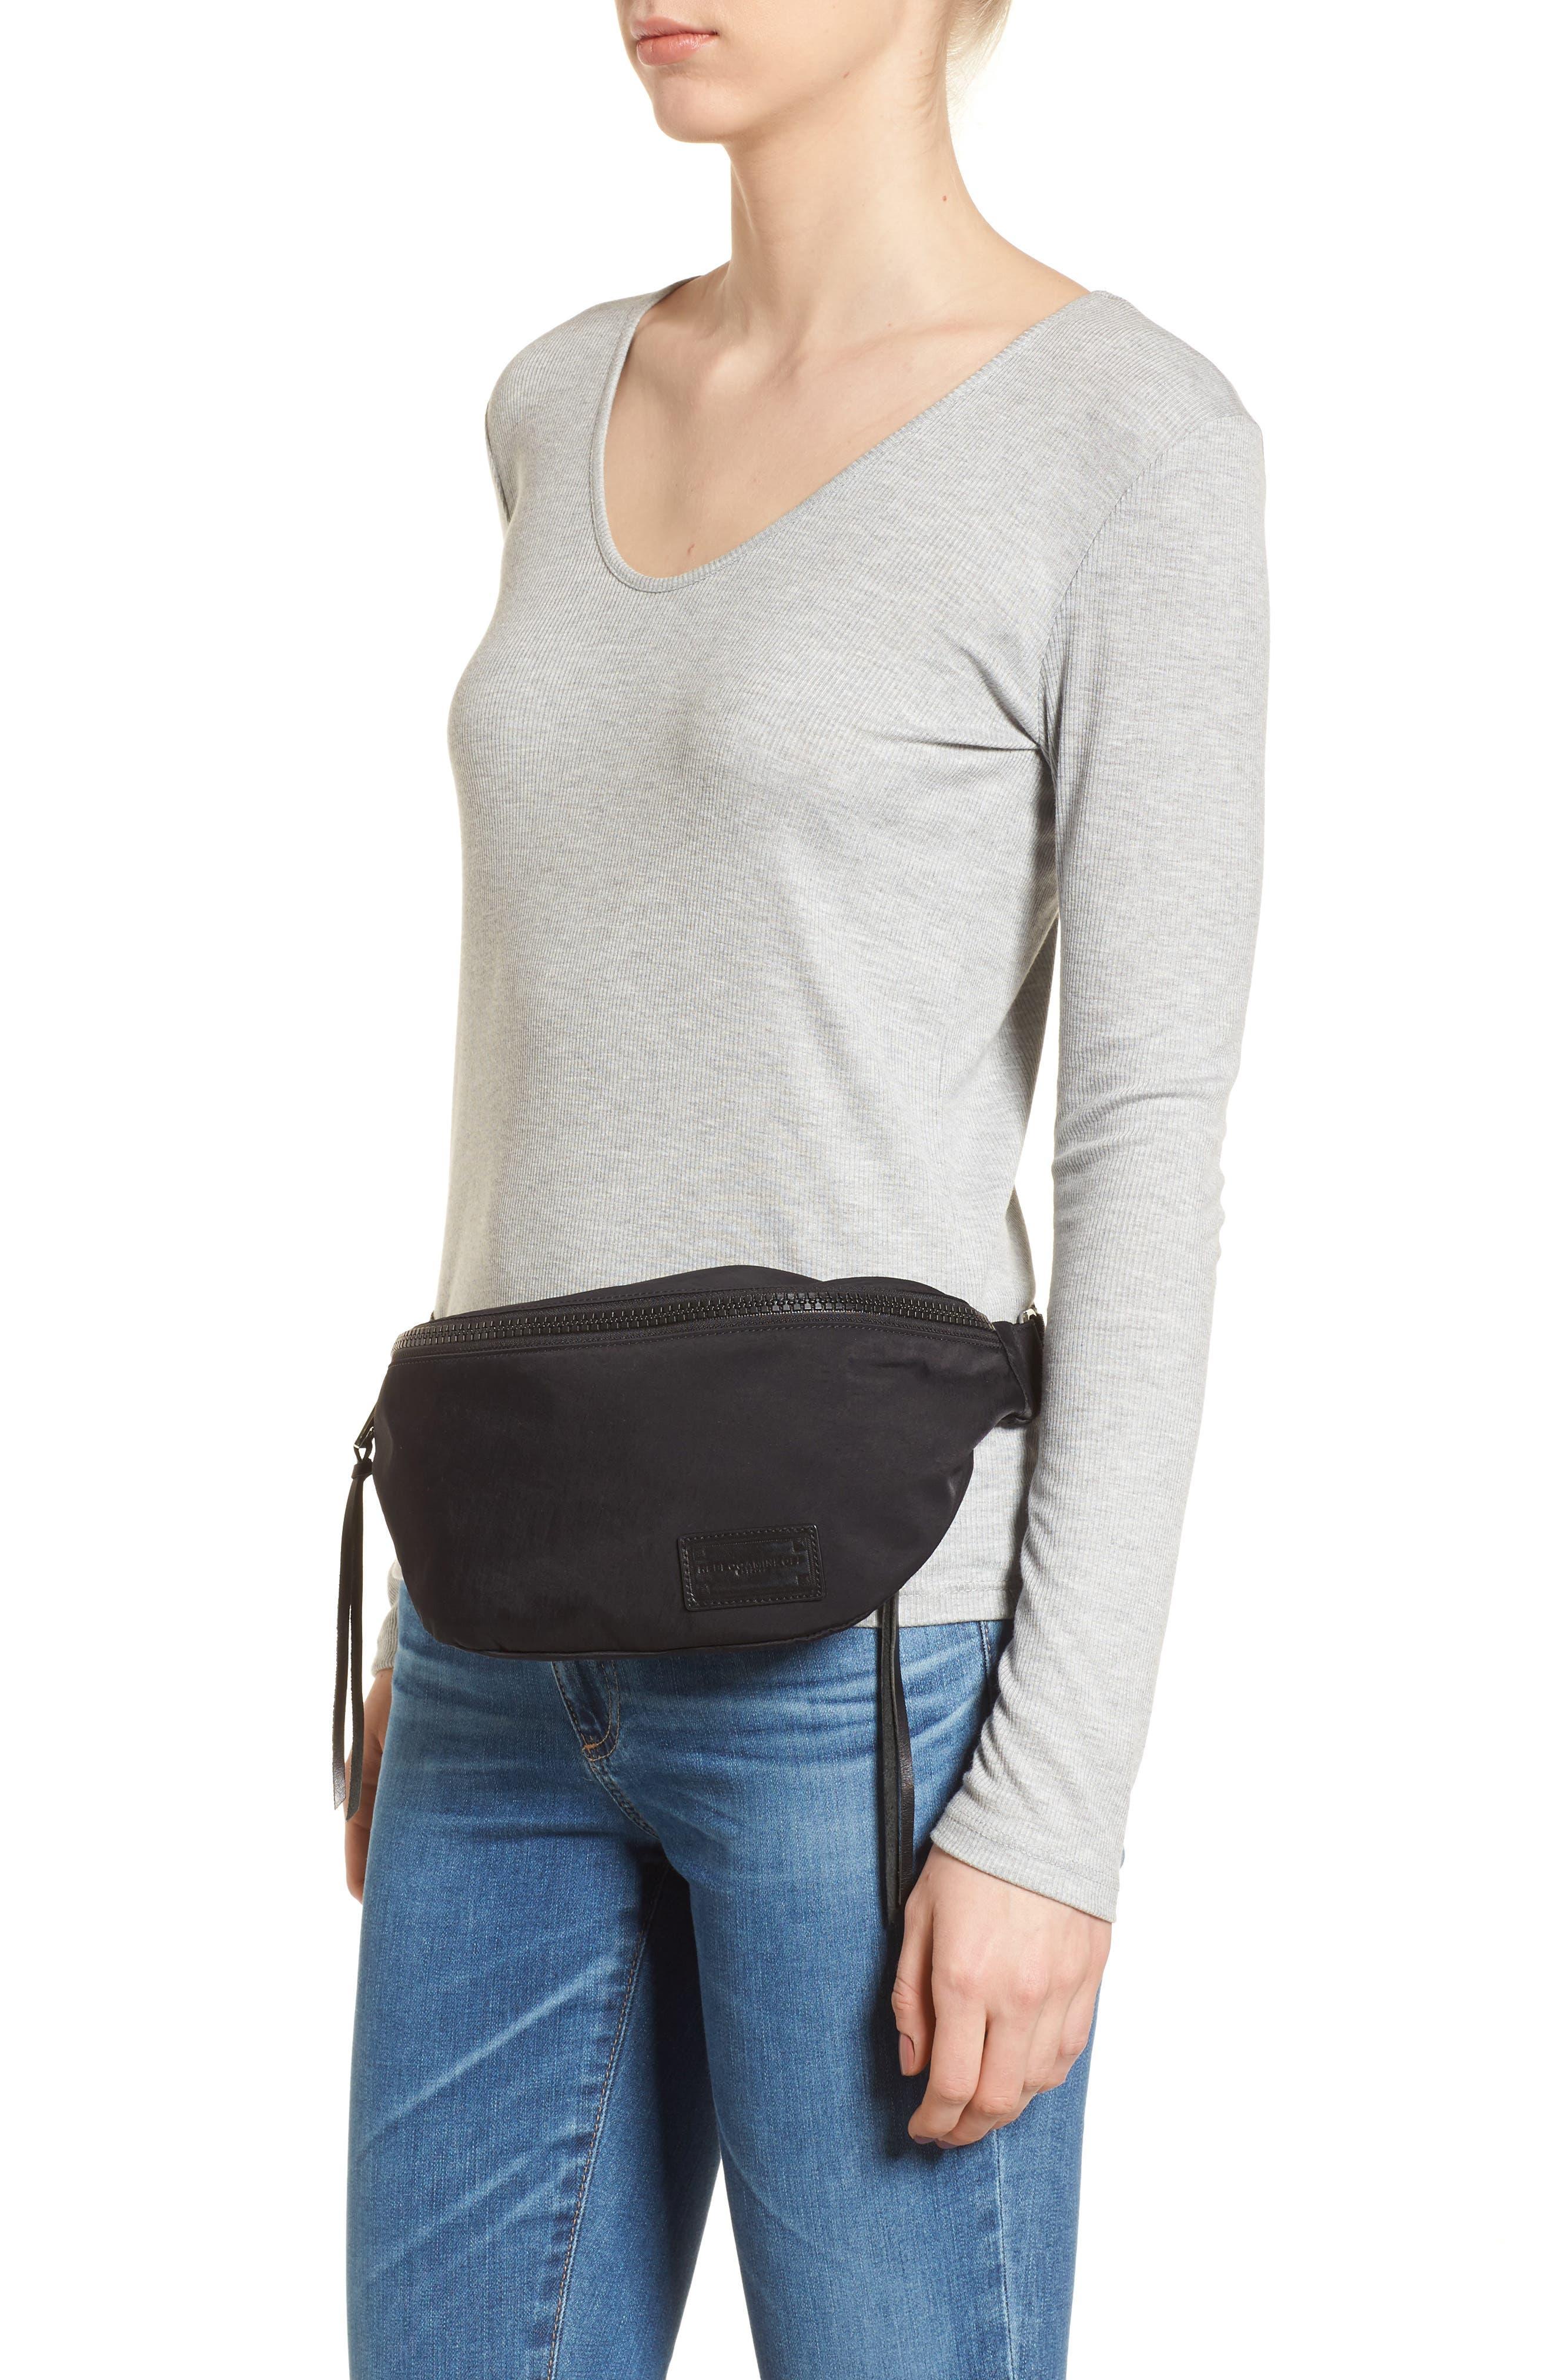 REBECCA MINKOFF, Nylon Belt Bag, Alternate thumbnail 2, color, BLACK